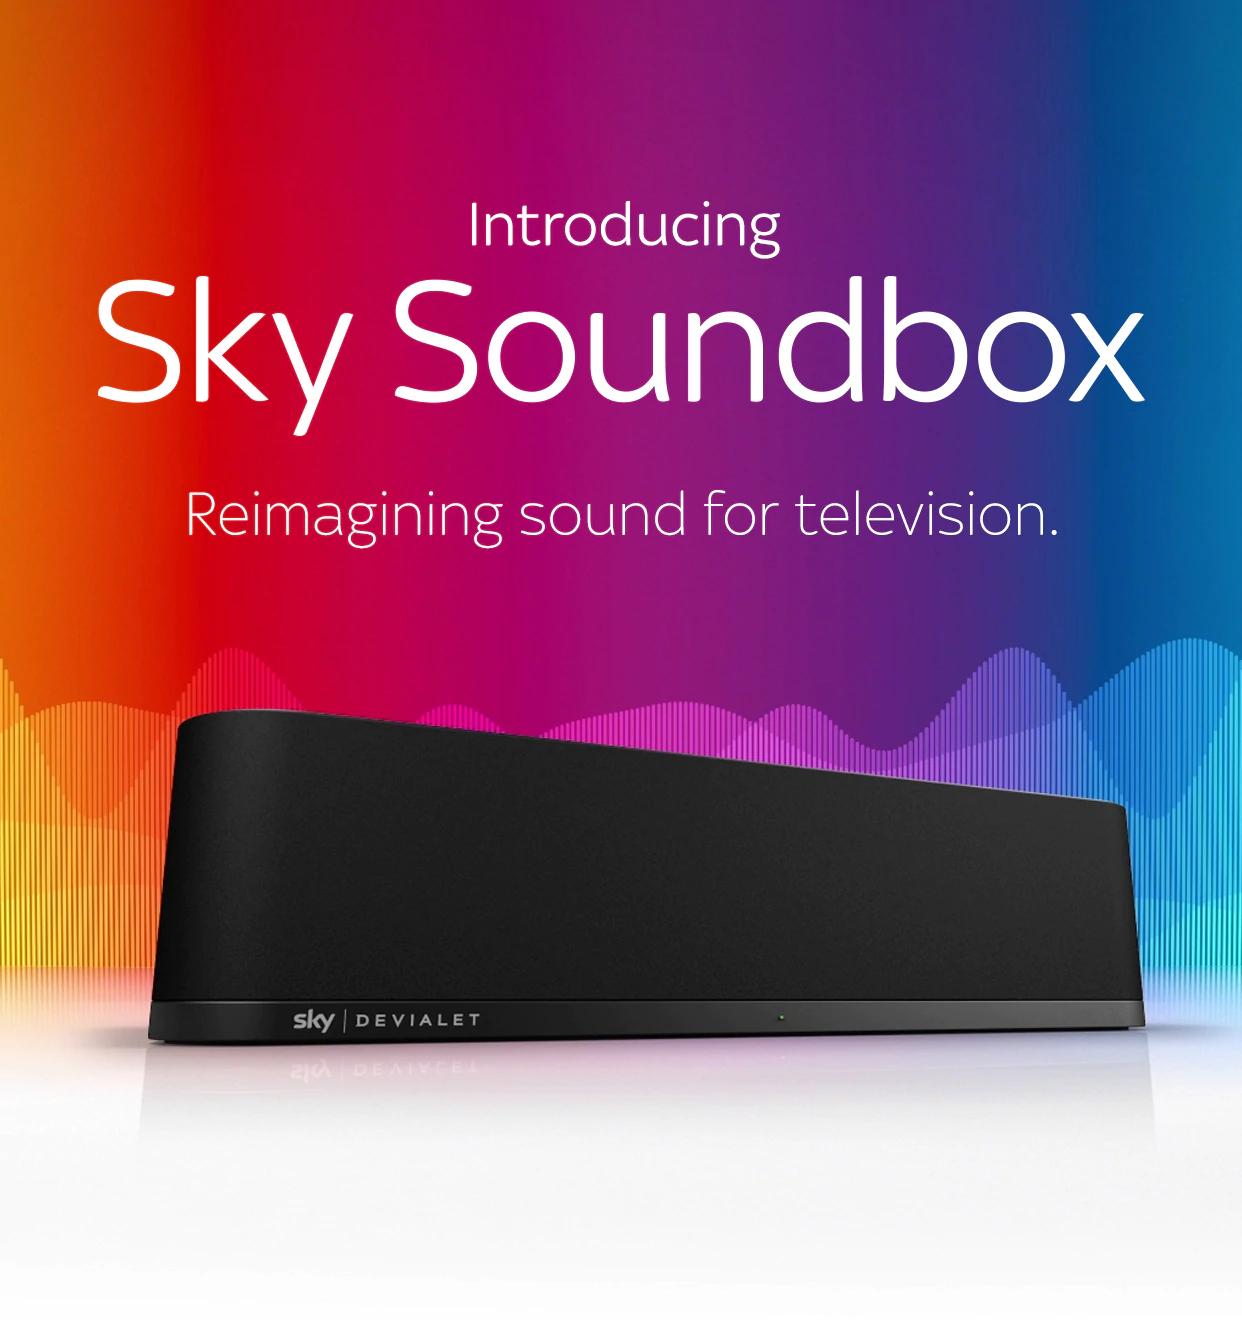 Black Friday: Sky Soundbox now £189 @ Sky (customers)